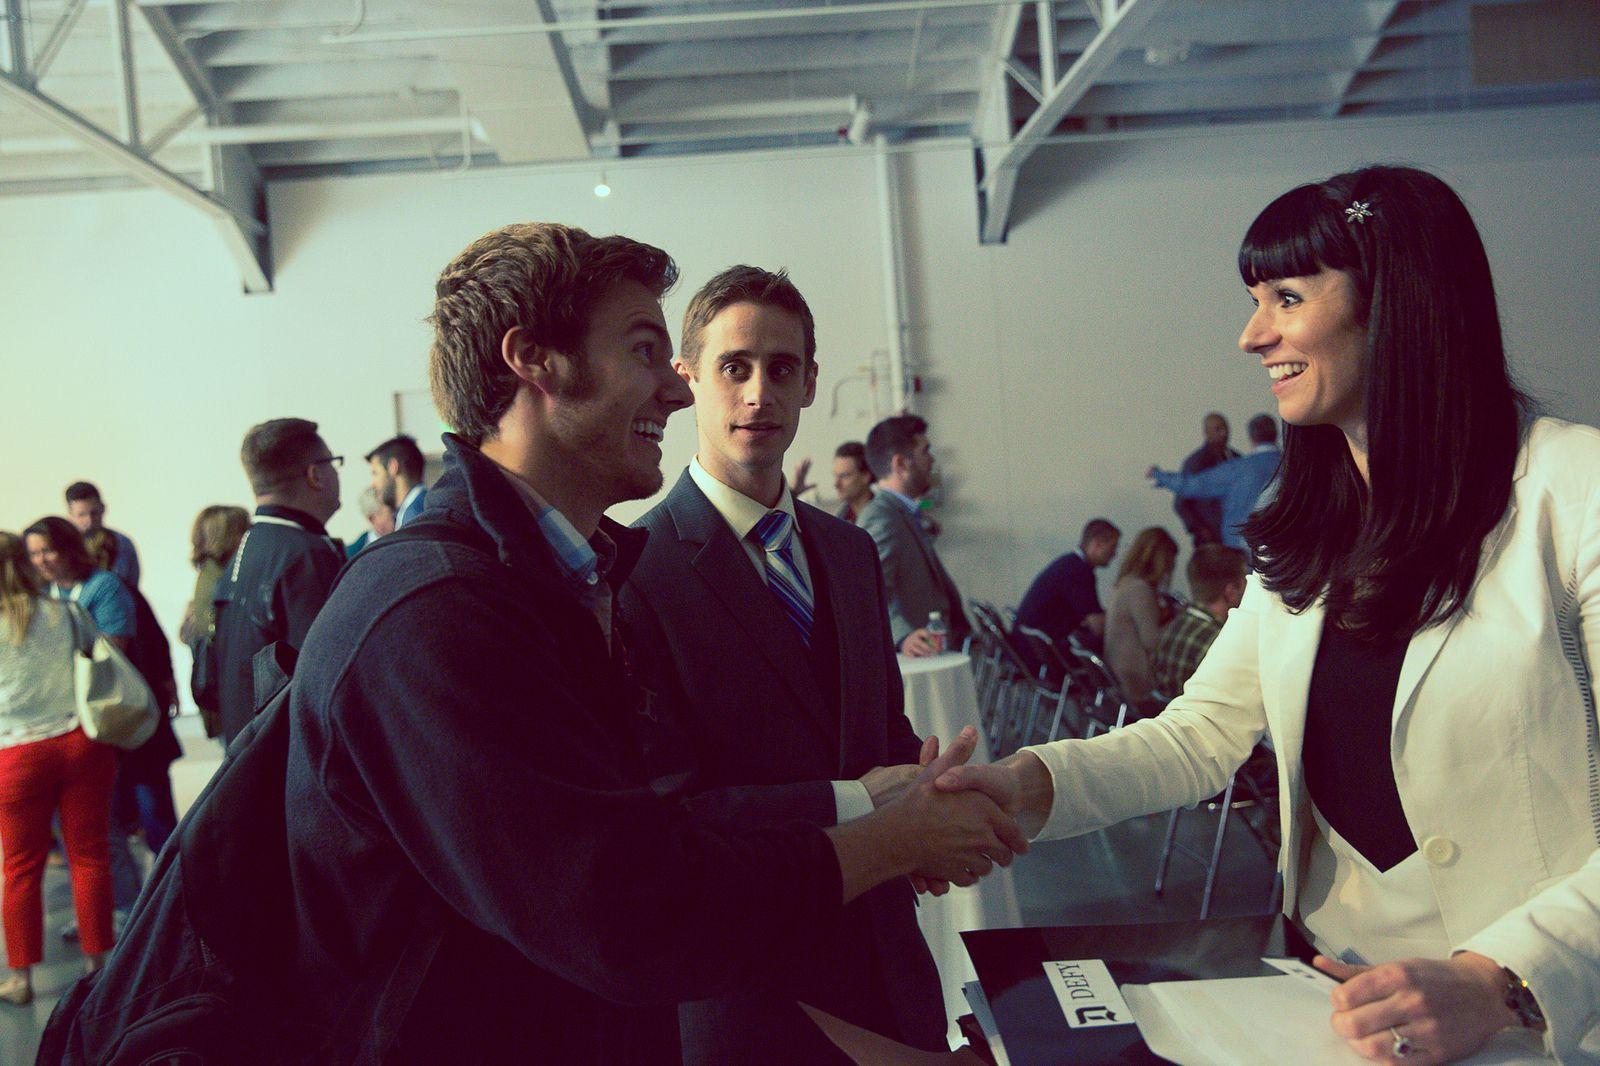 People Business Handshake